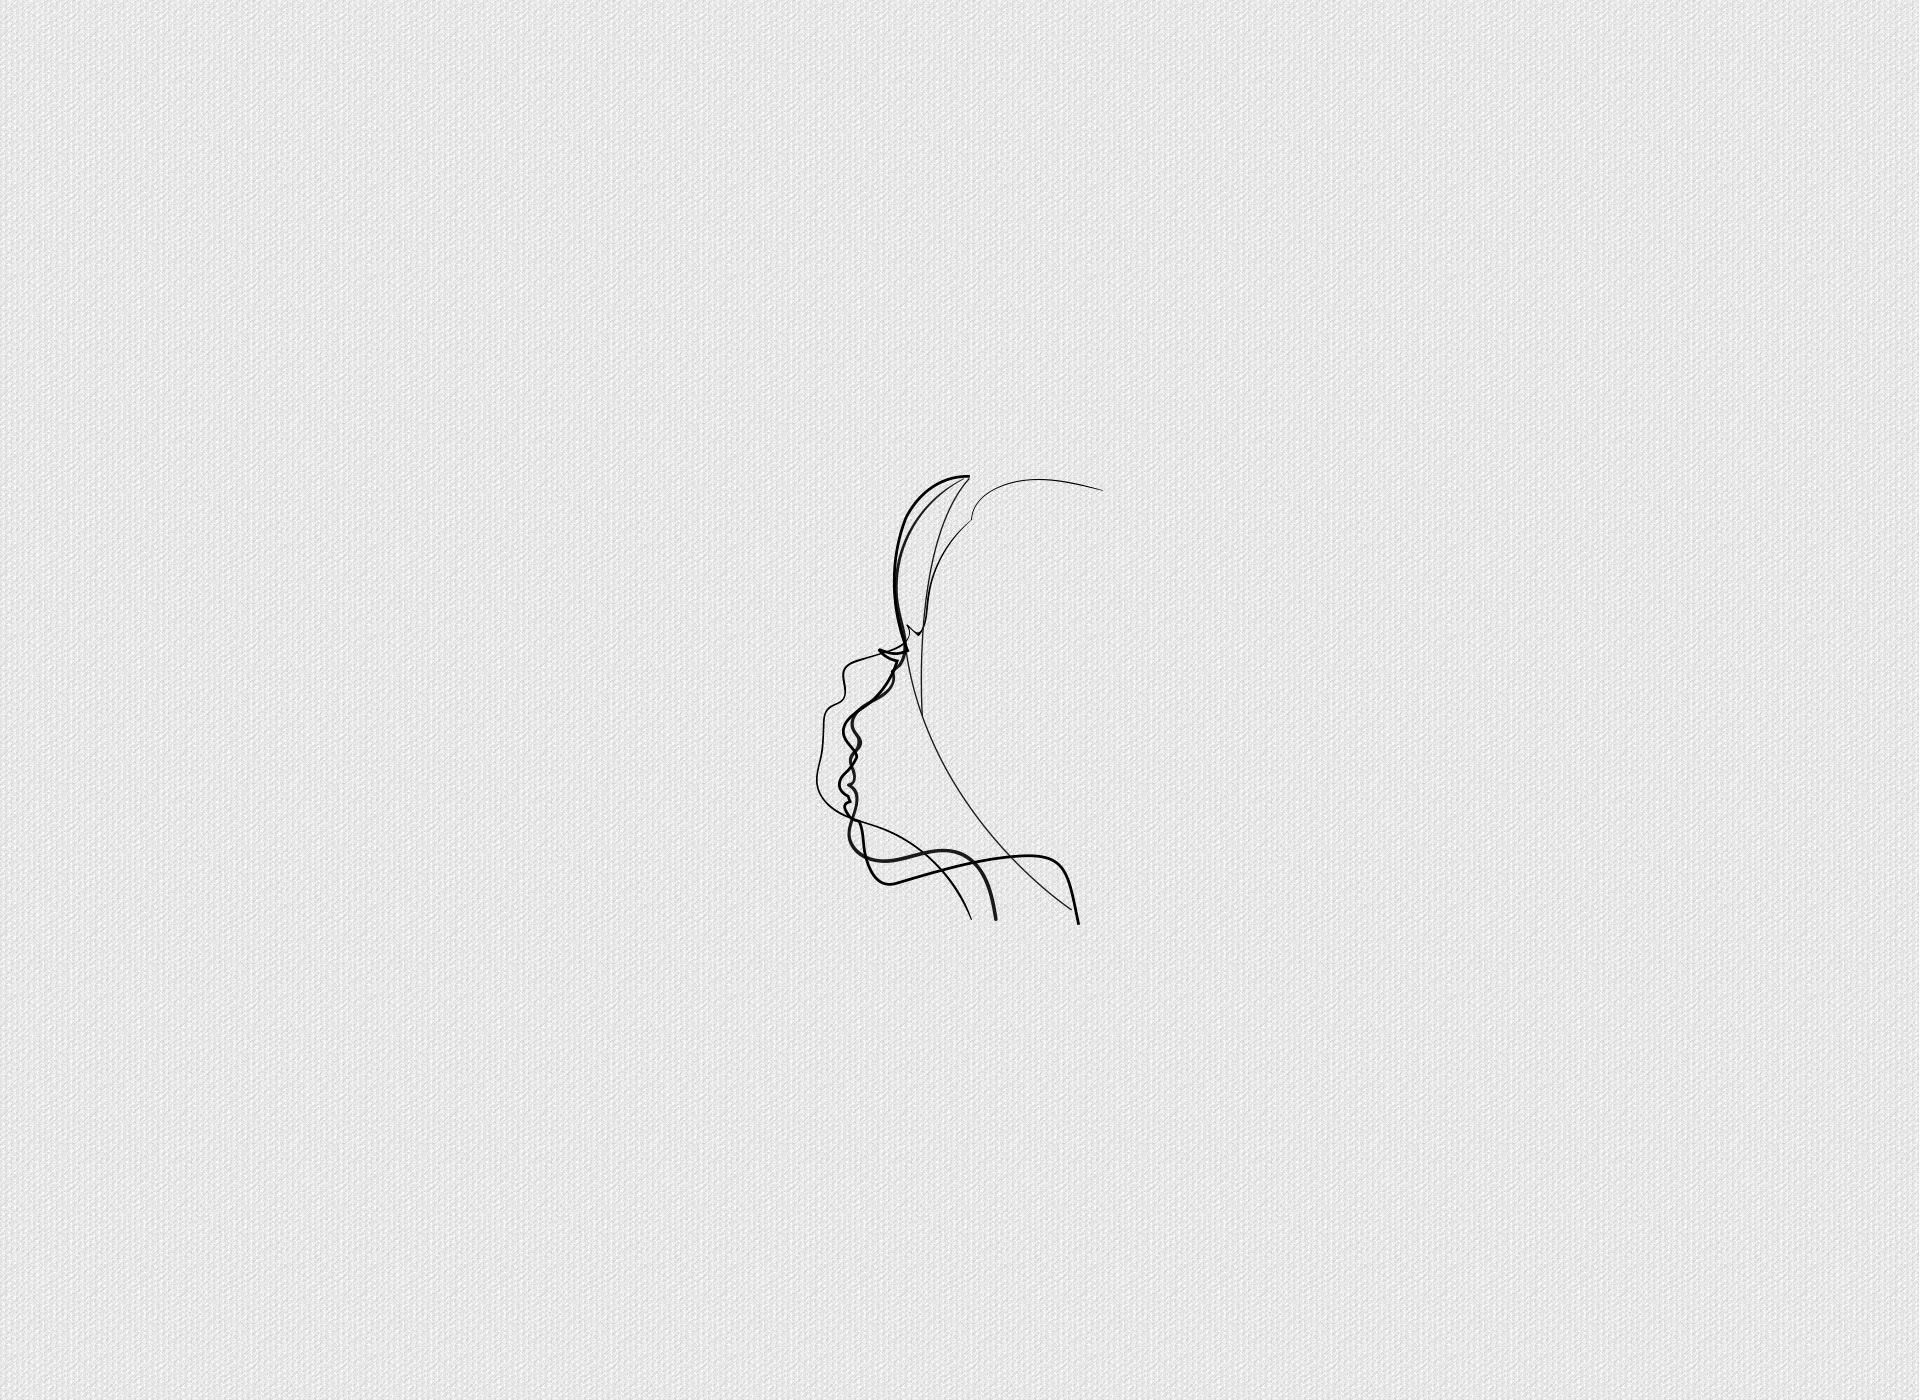 Logo design coaching line sketches סקיצות לוגו אימון עסקי